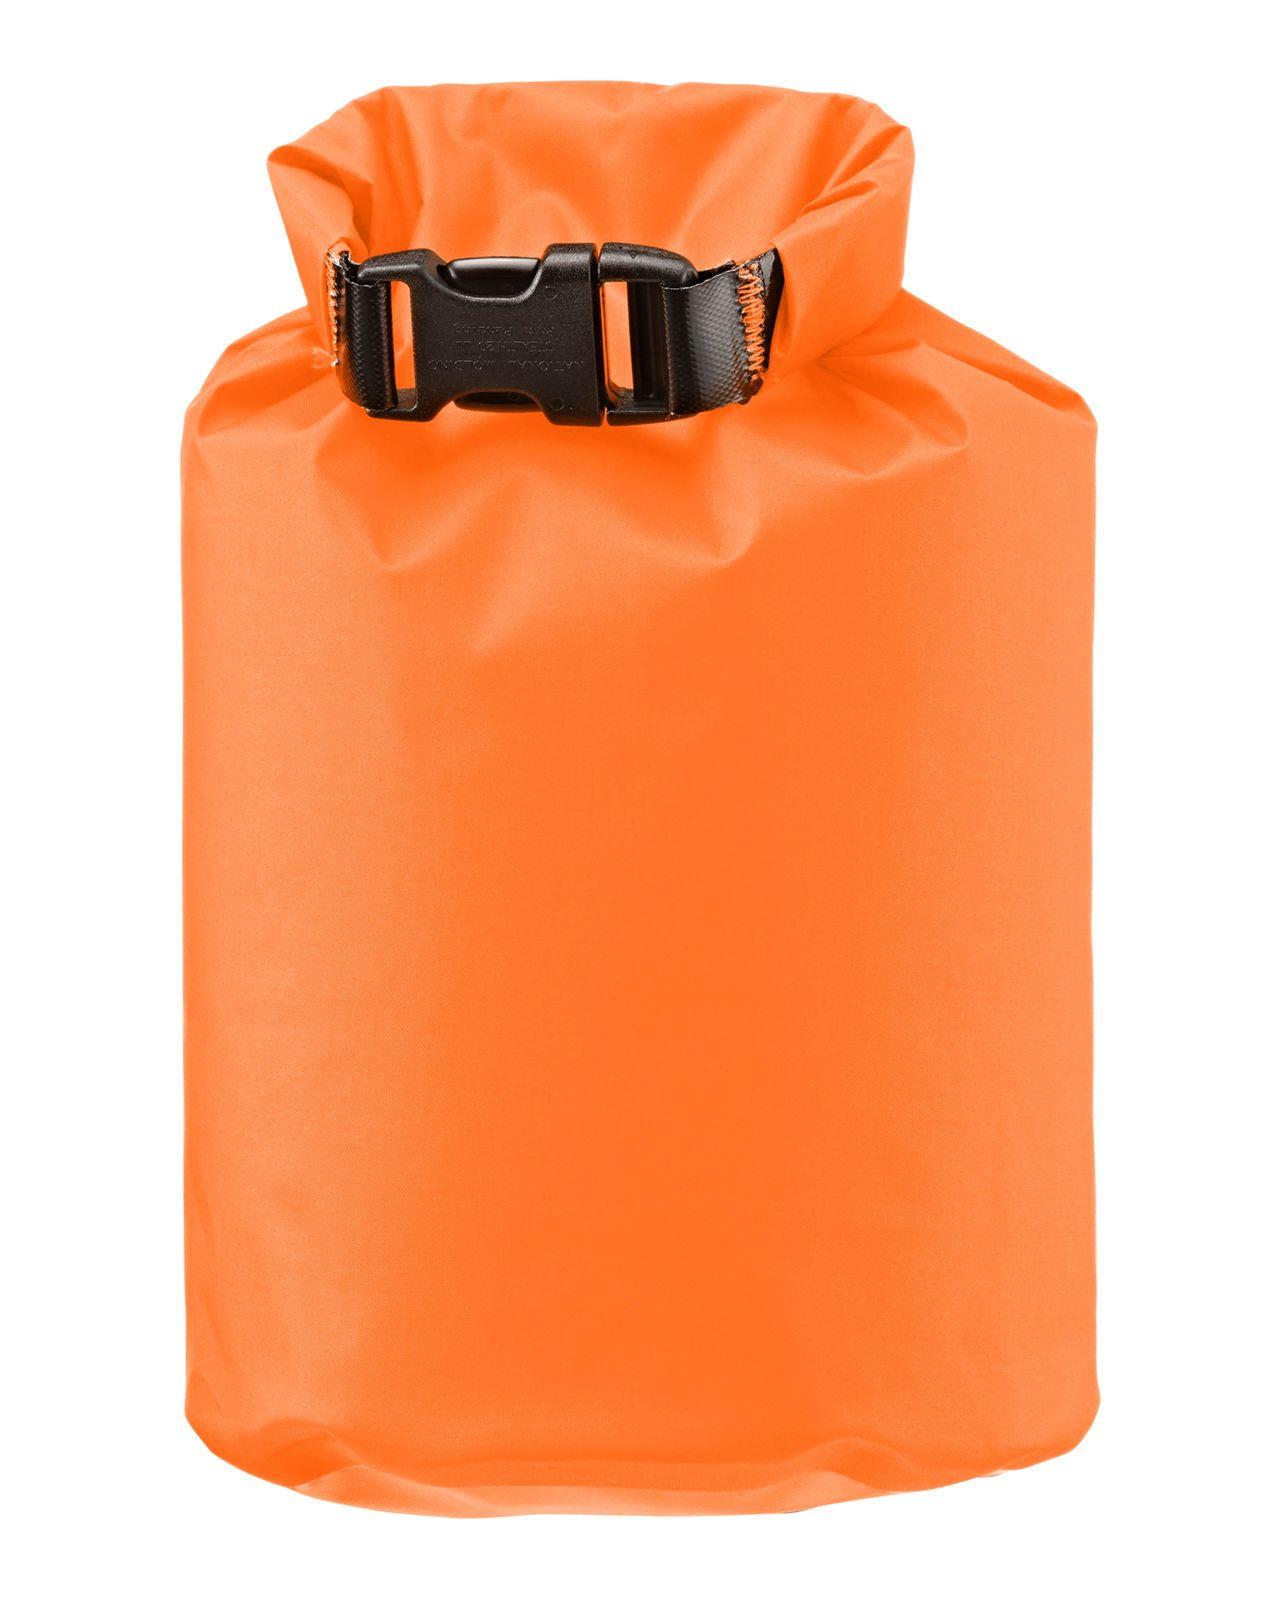 ORTLIEB Dry-Bag PS10 1,5L Orange